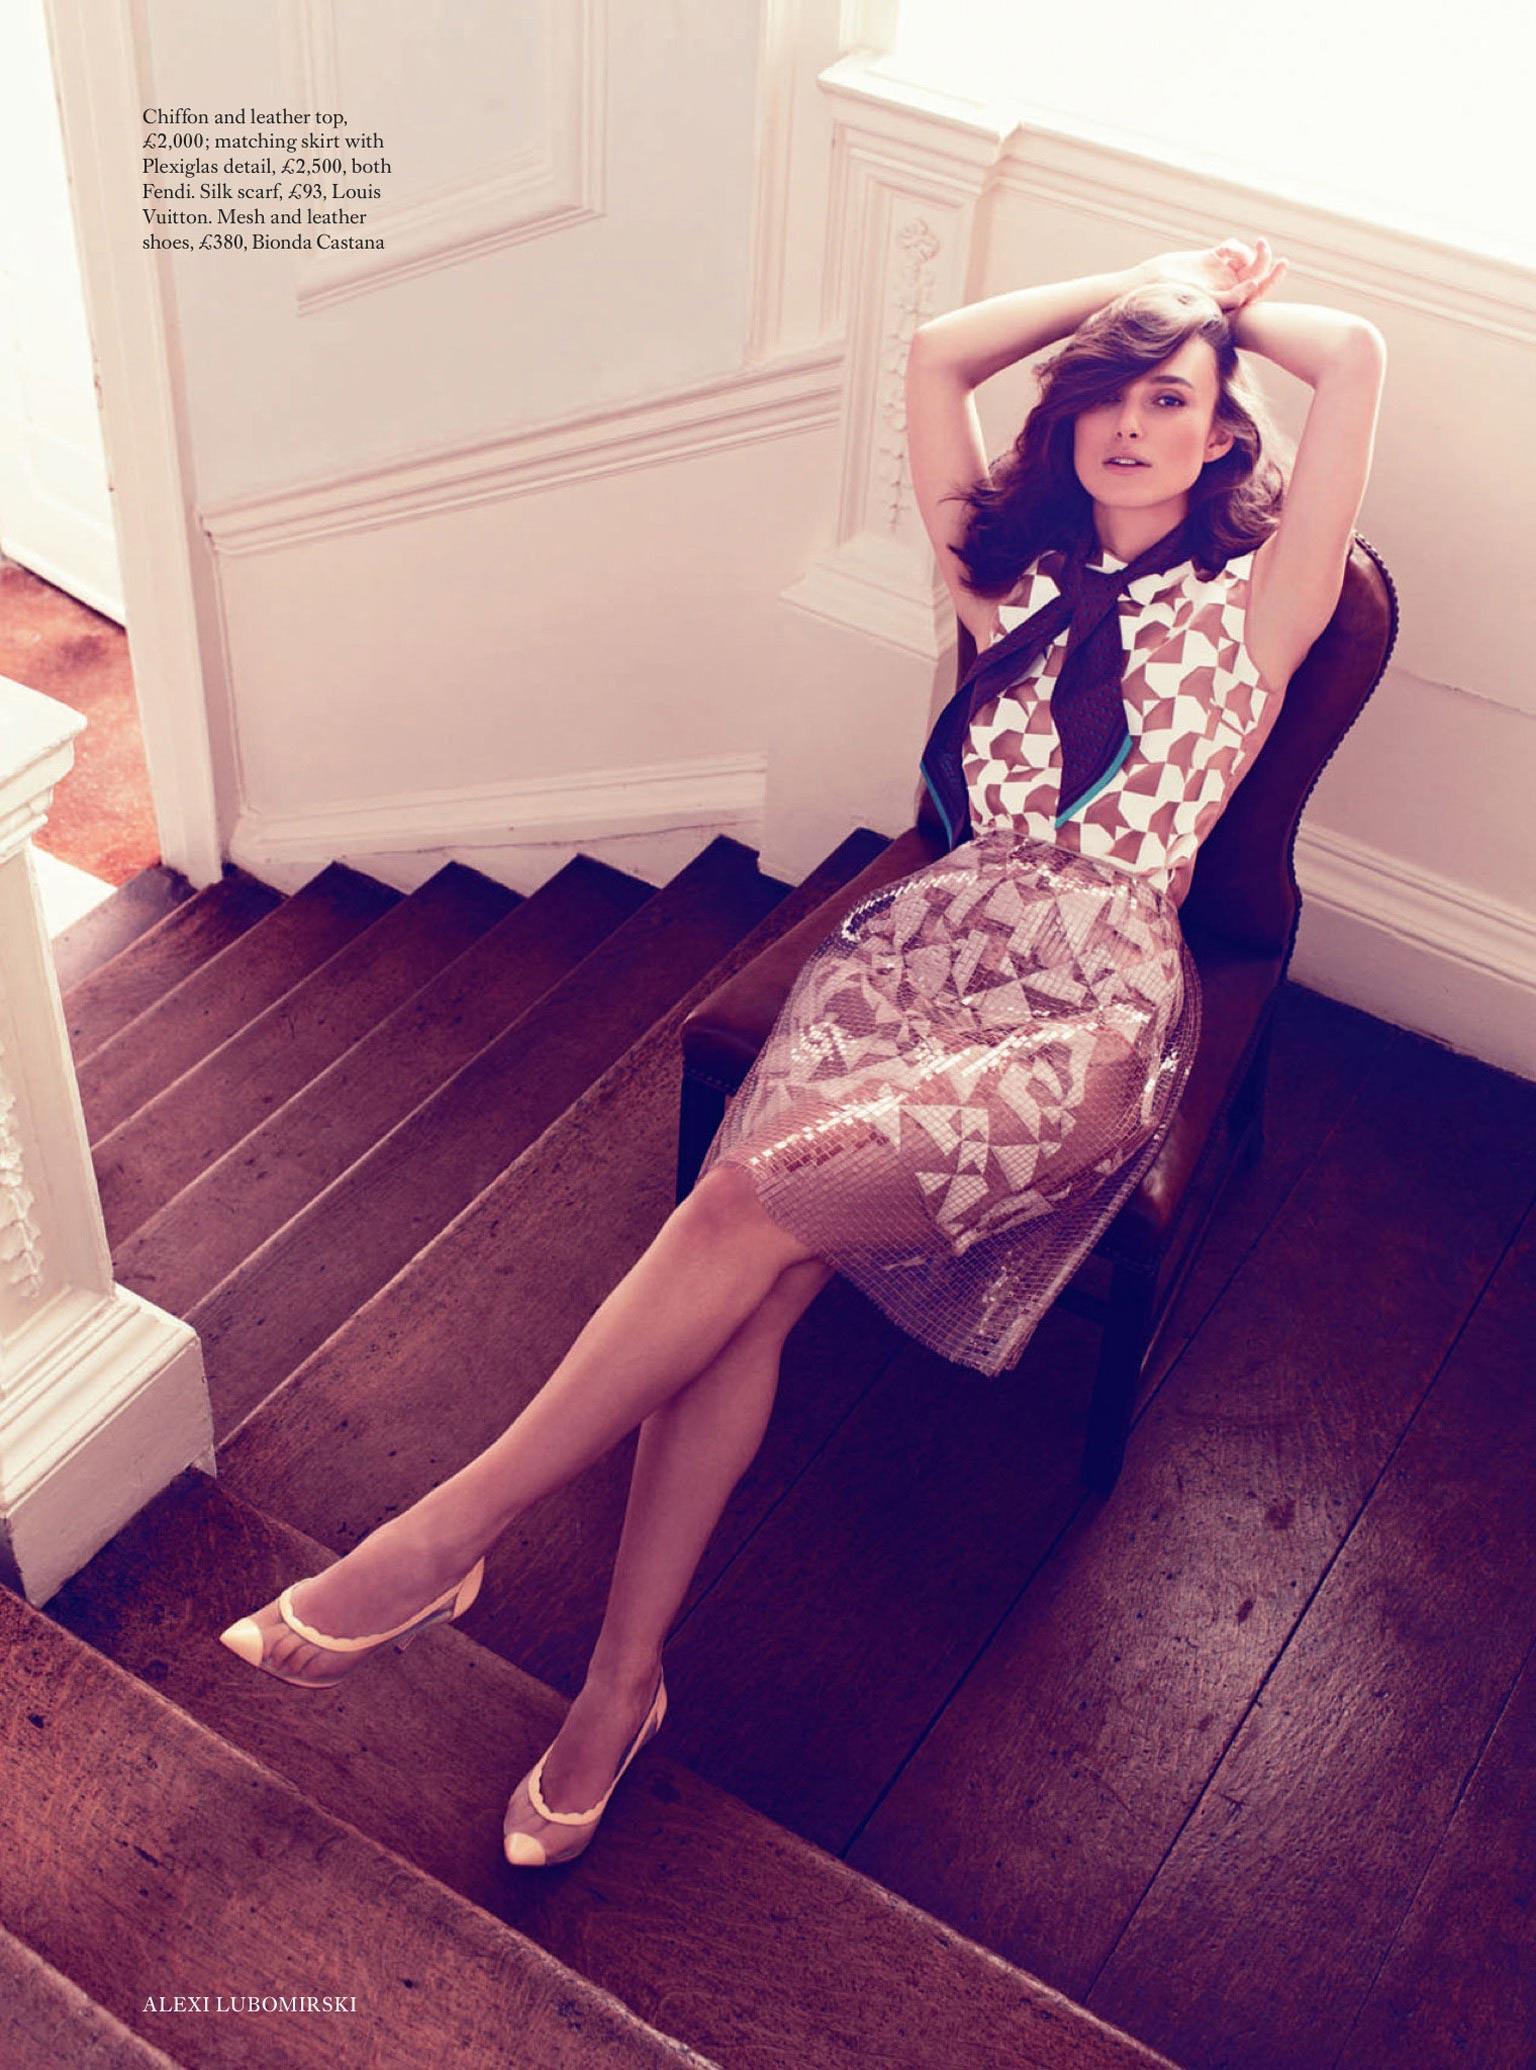 Keira Knightley Photoshoot For Harper S Bazaar Magazine